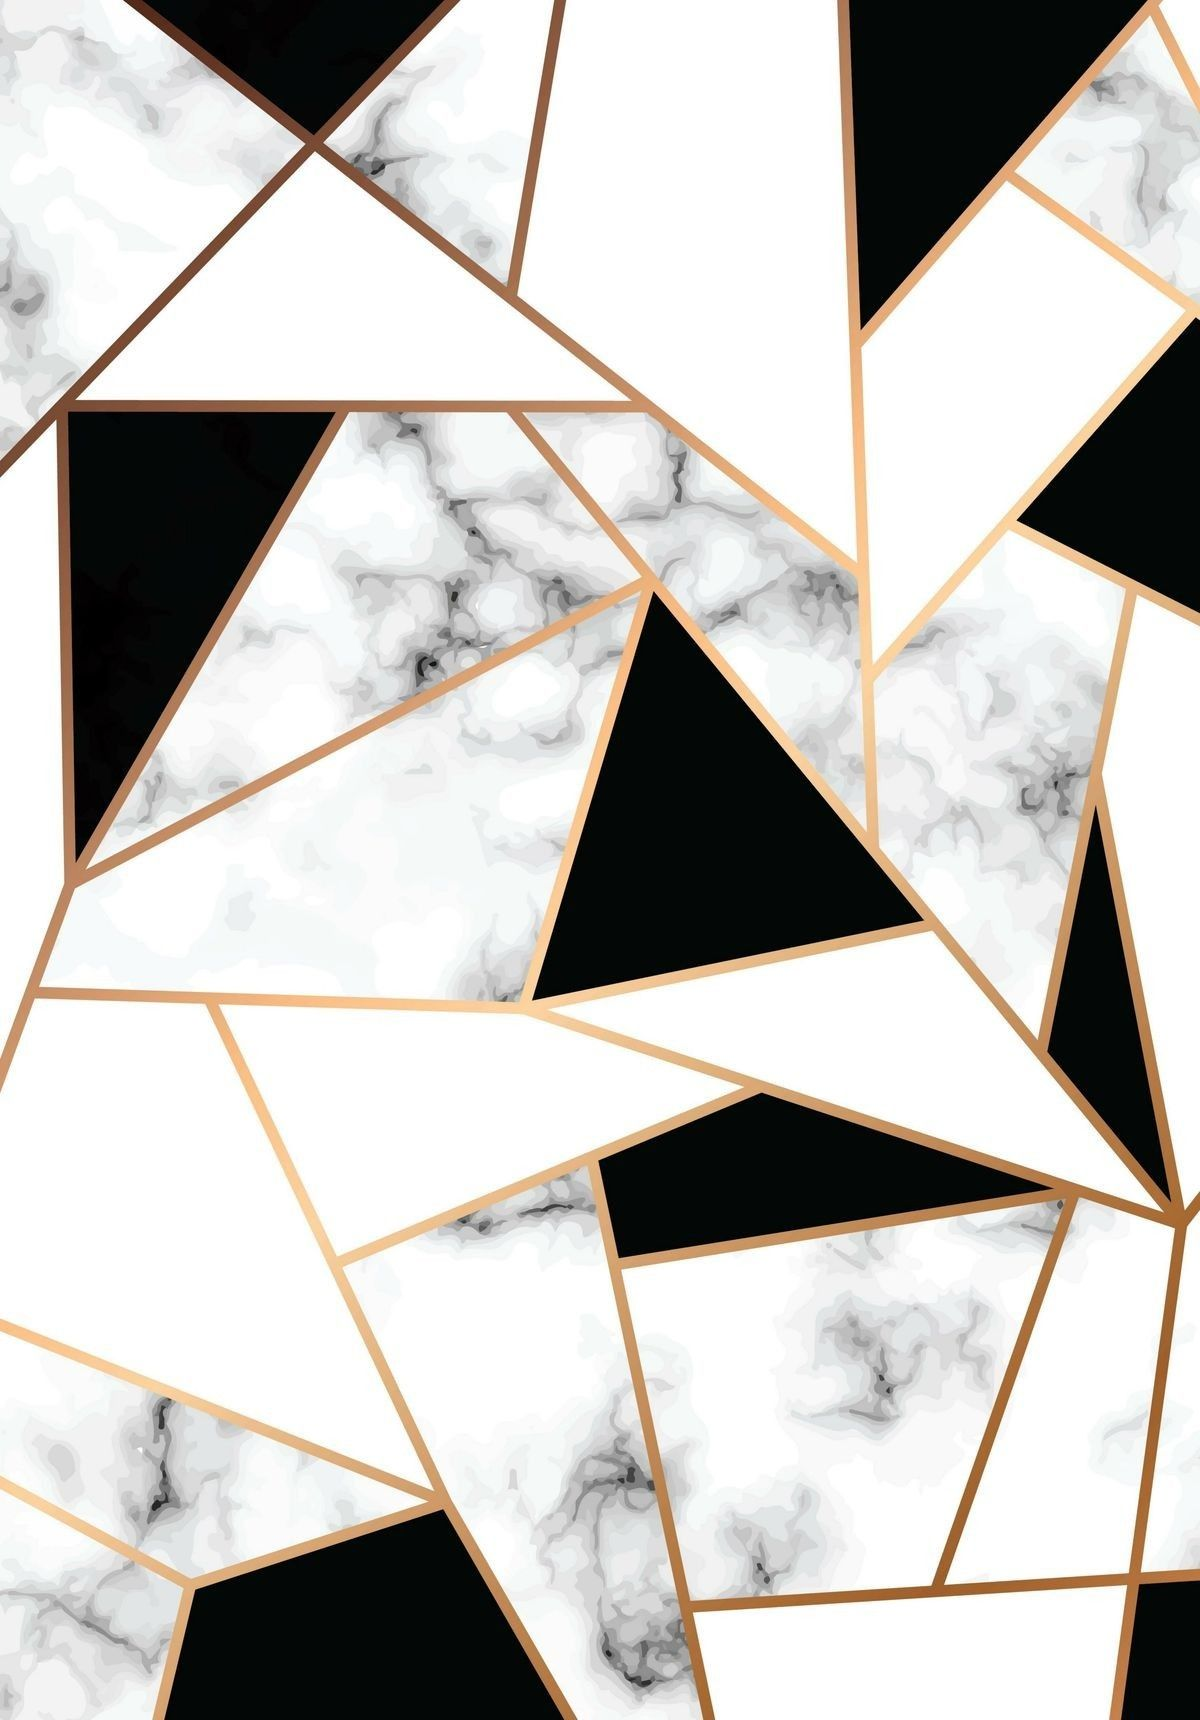 Marie Mottet Adli Kullanicinin Kirlenttt Panosundaki Pin 2020 Iphone Arkaplanlari Galeri Duvari Baski